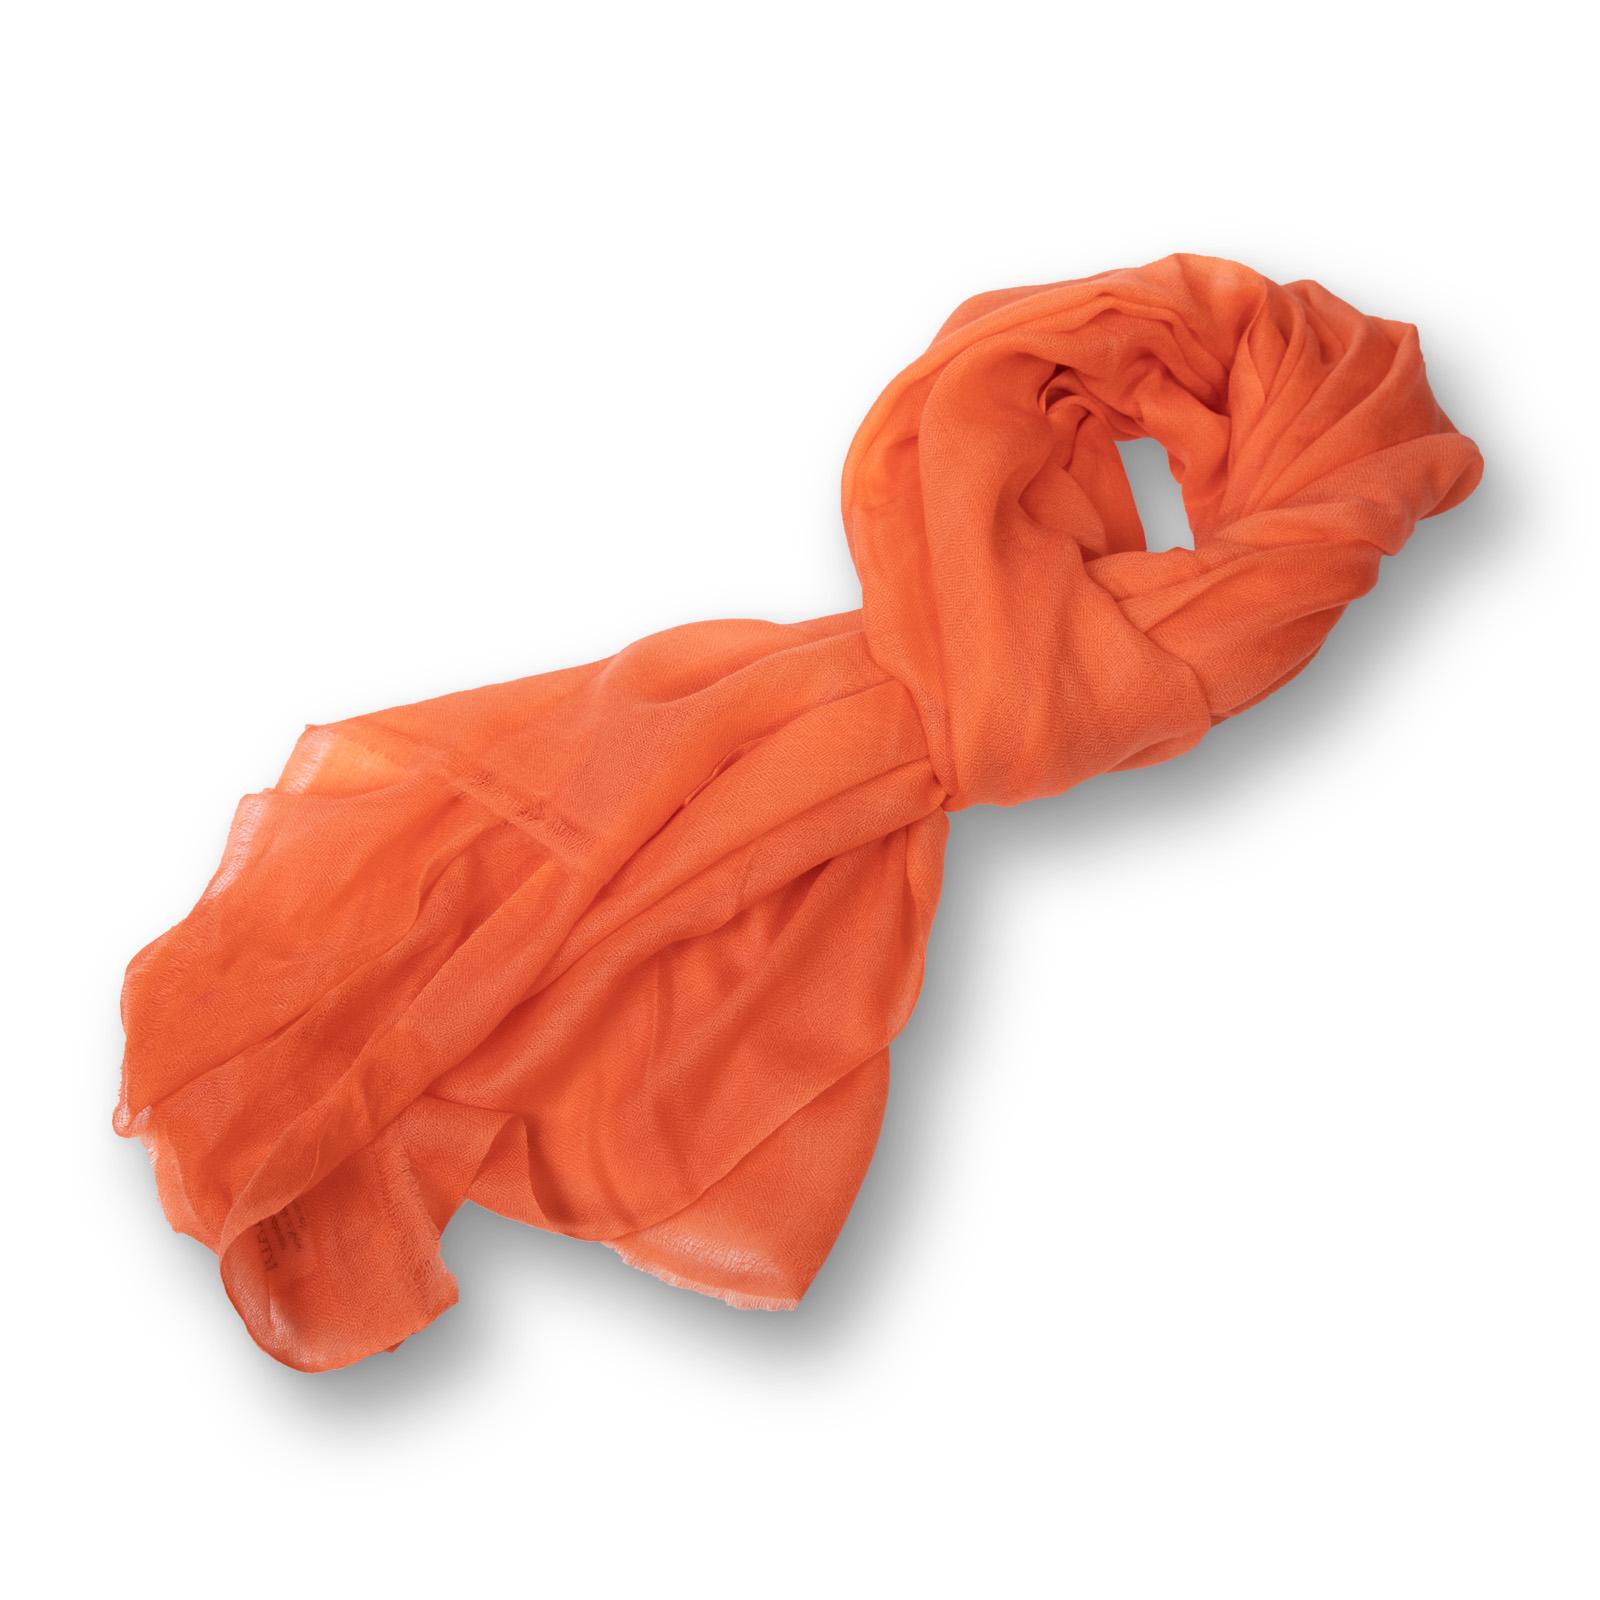 Pashmina - 100%  Cashmere  einfarbig aus Nepal  70x200 cm  apricot